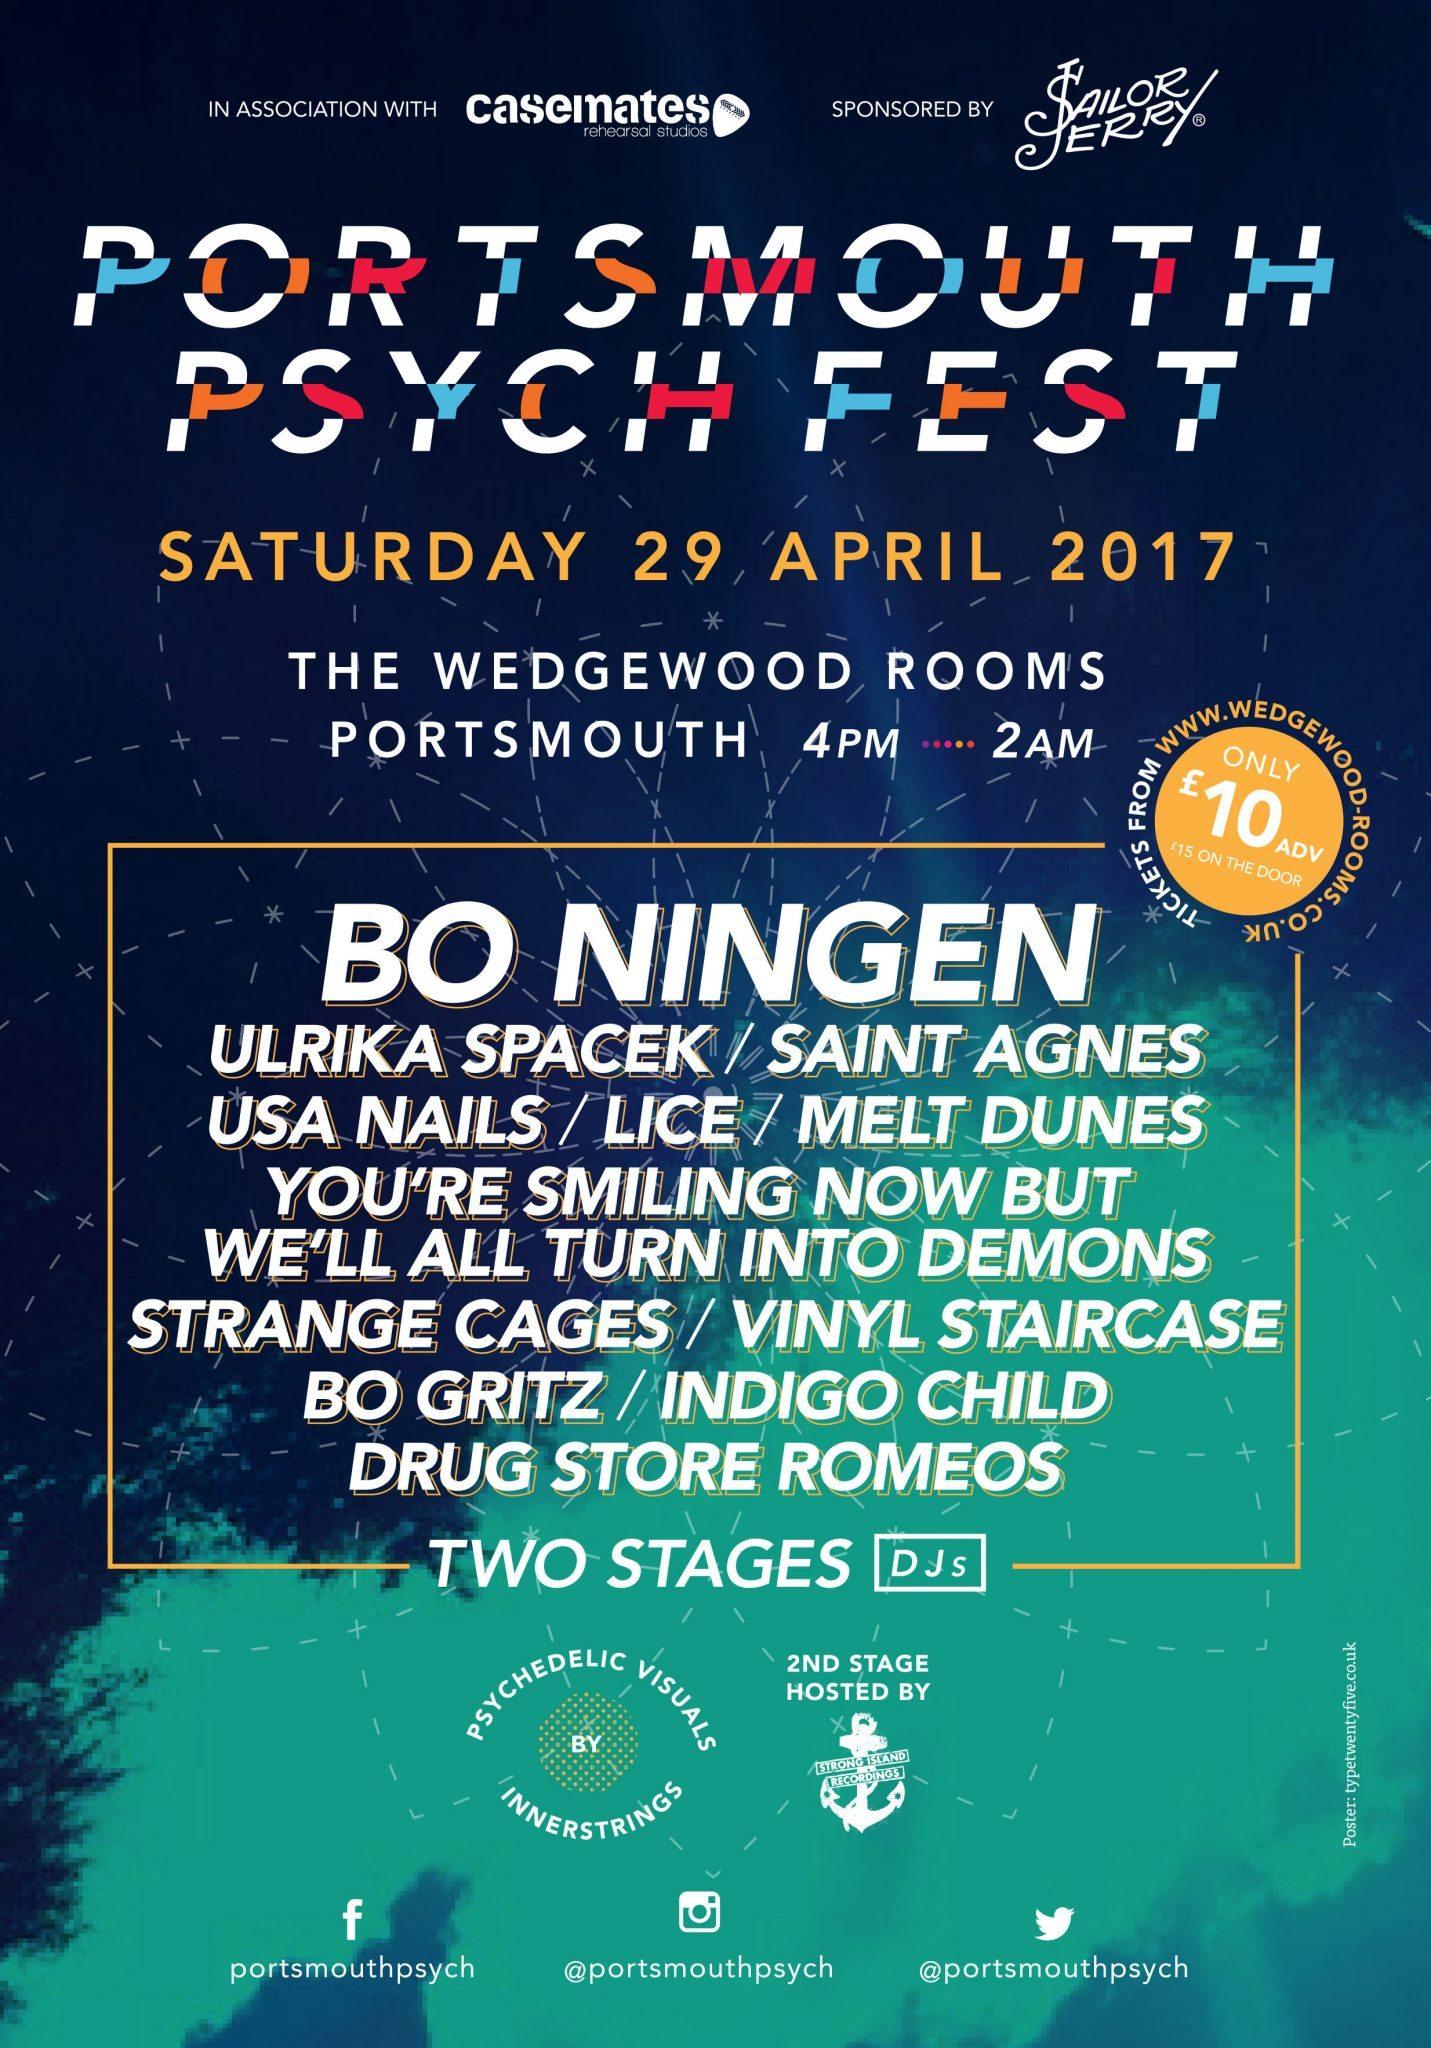 Portsmouth Psych Fest